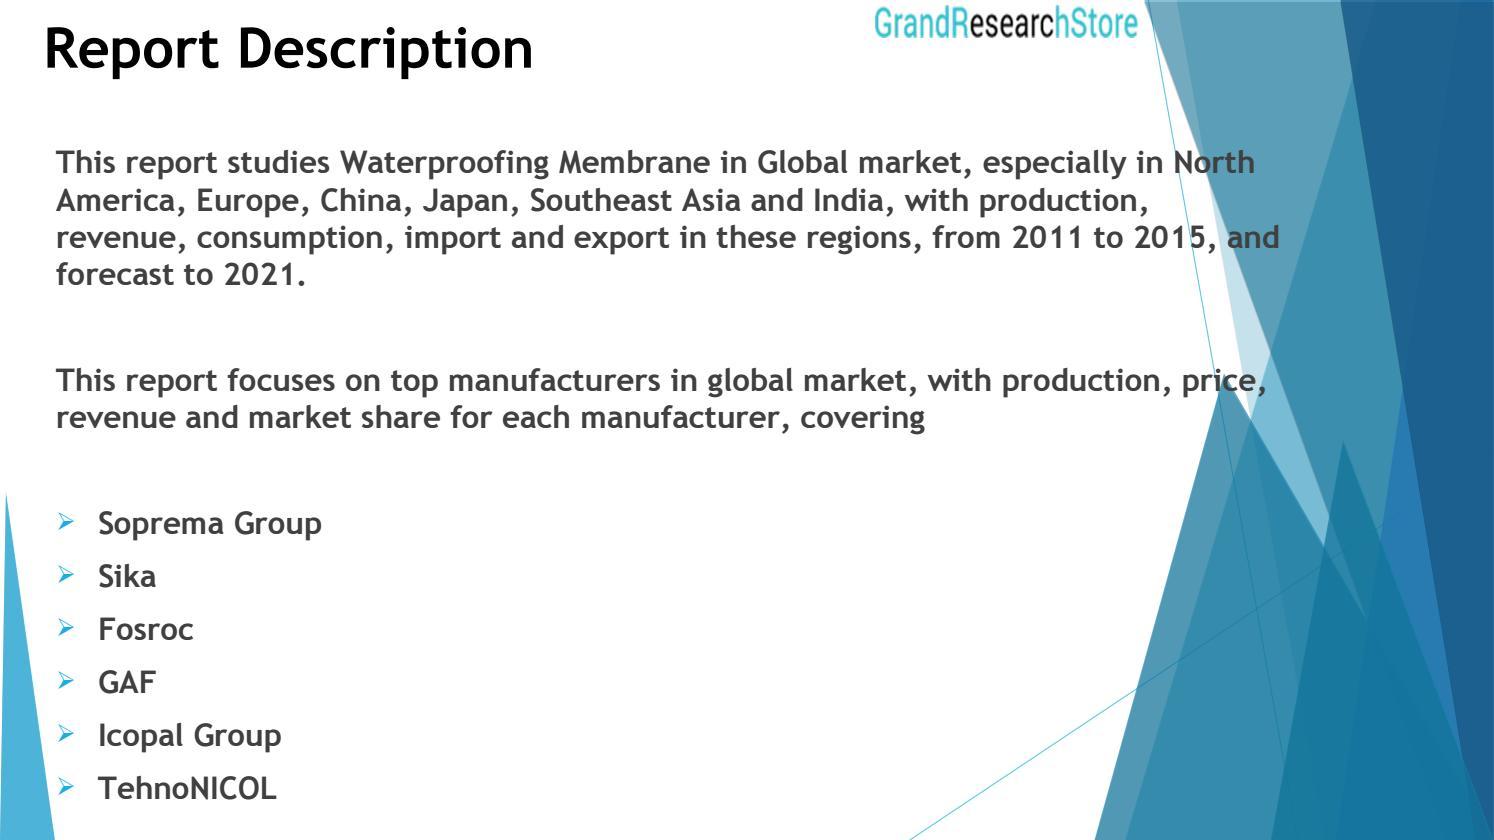 Global Waterproofing Membrane Market Professional Survey